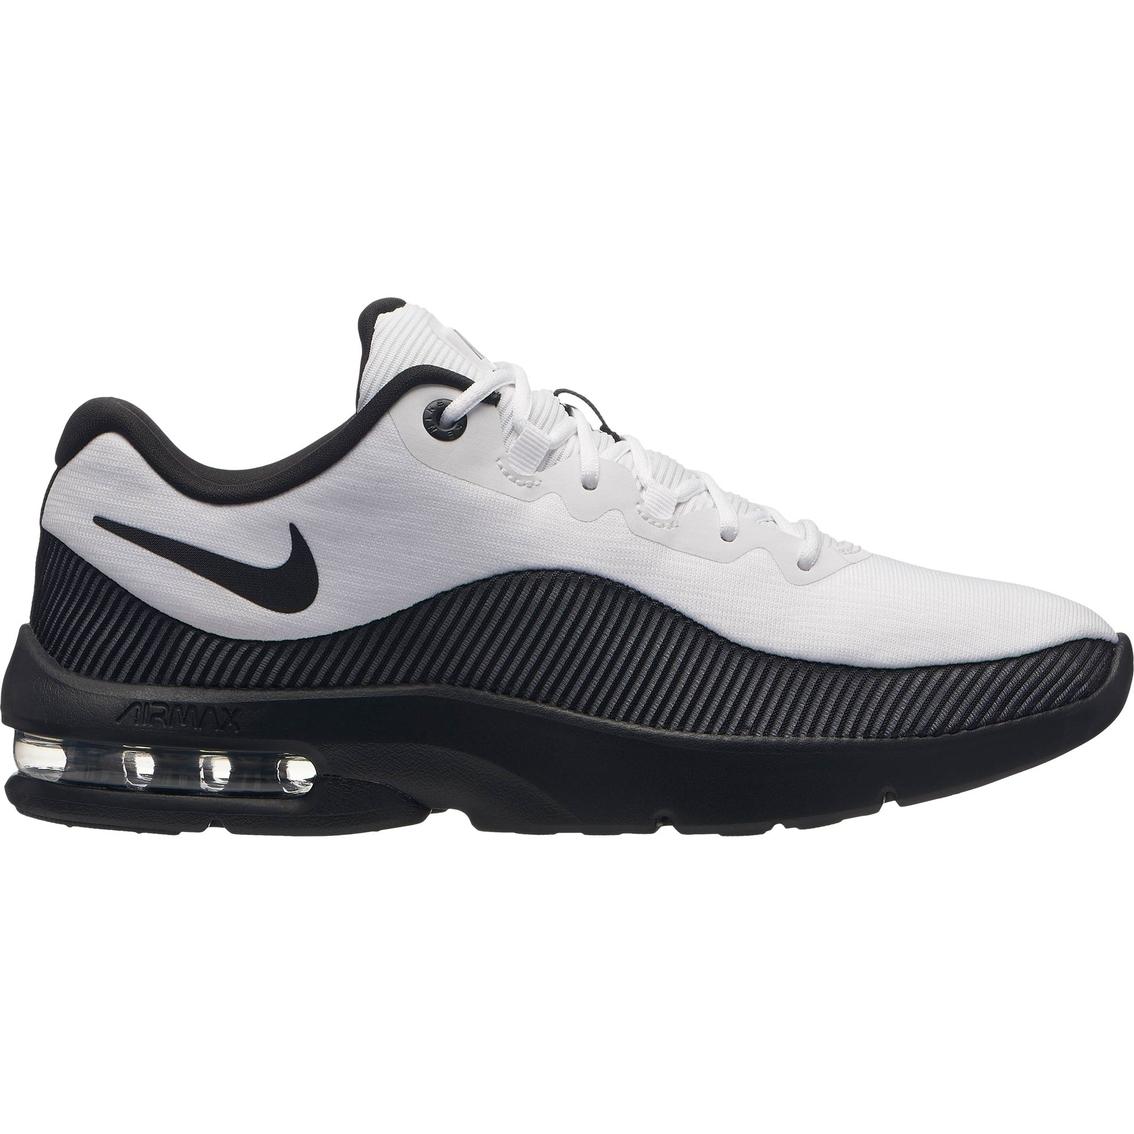 nike air max advantage 2 women's running shoes